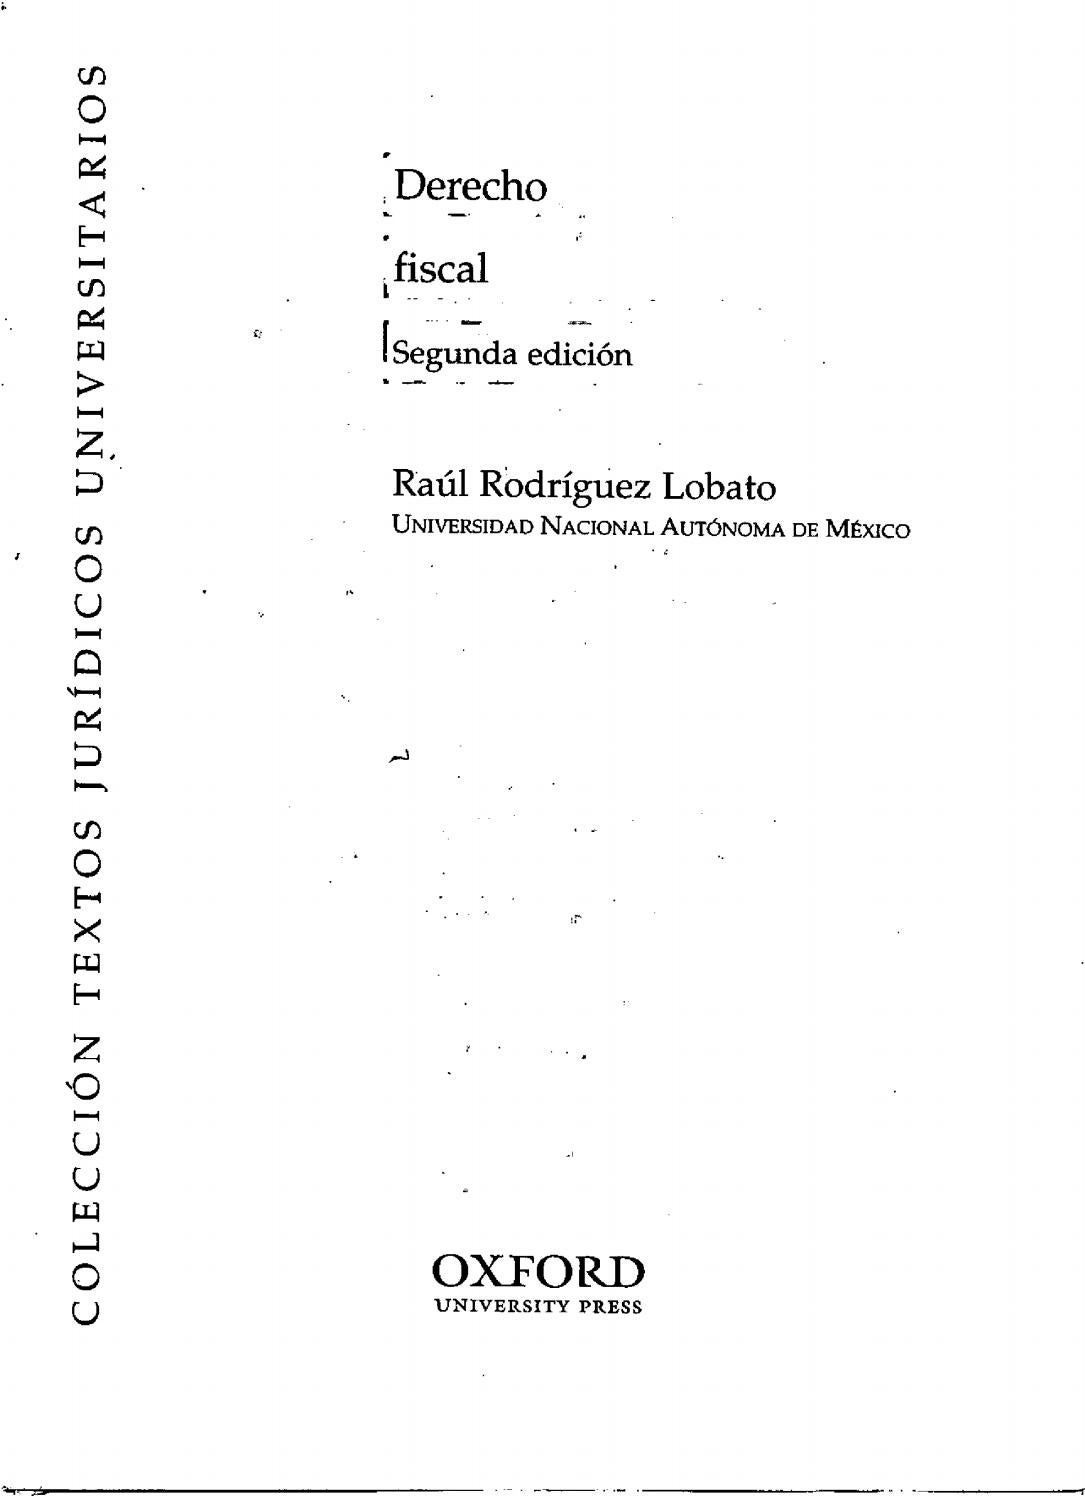 Derecho fiscal raul rodriguez lobato by Adeprin - issuu